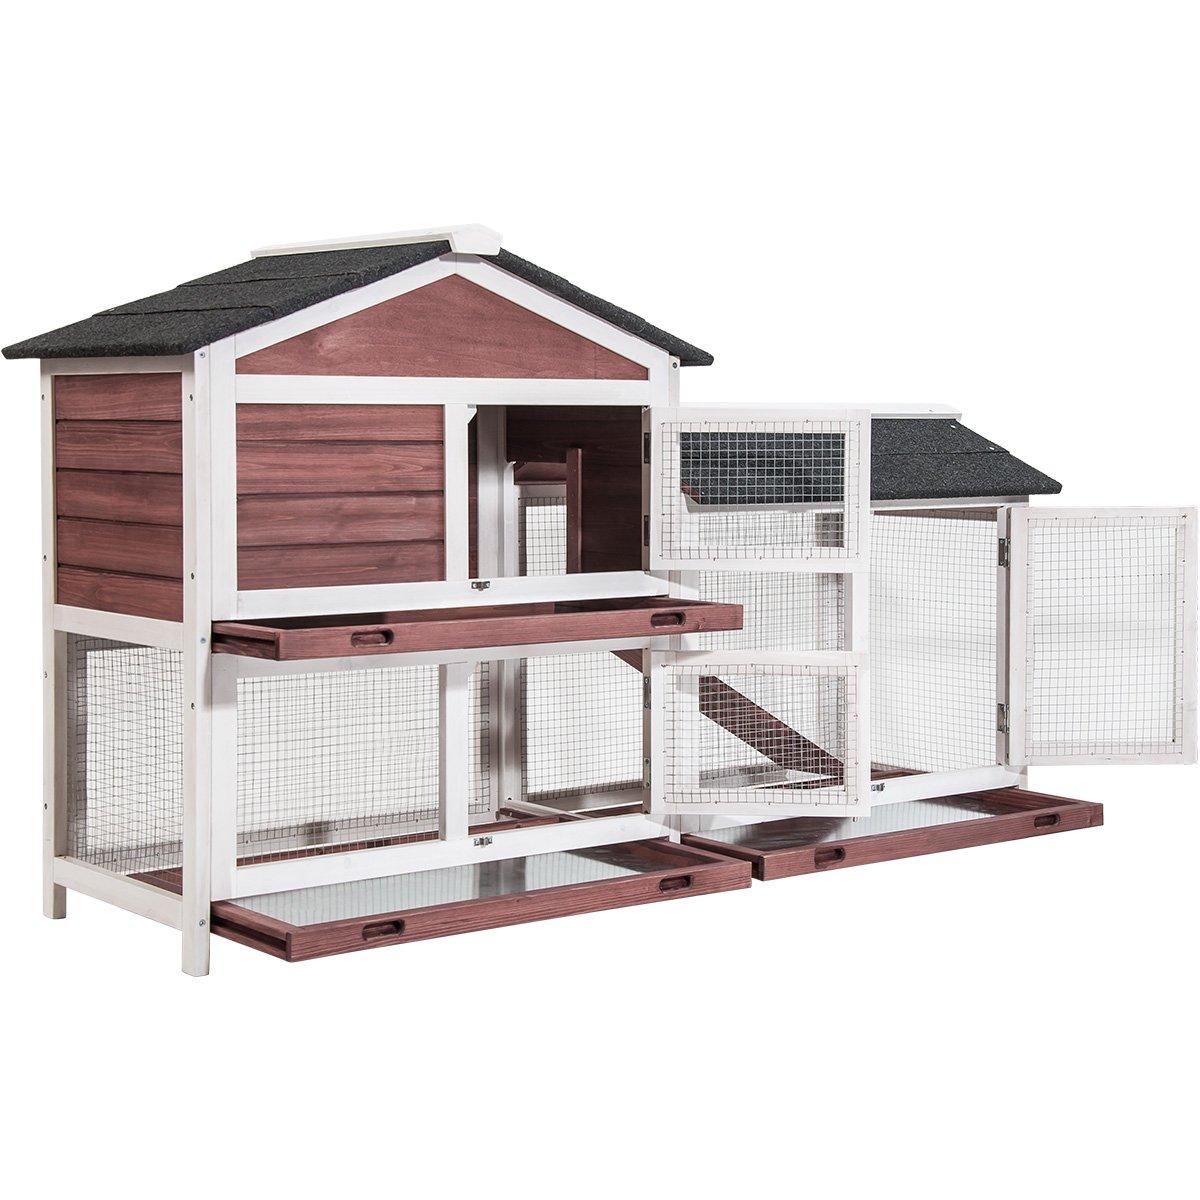 Amazon.com: Purlove Pet Rabbit Hutch Wooden House Chicken Coop for ...